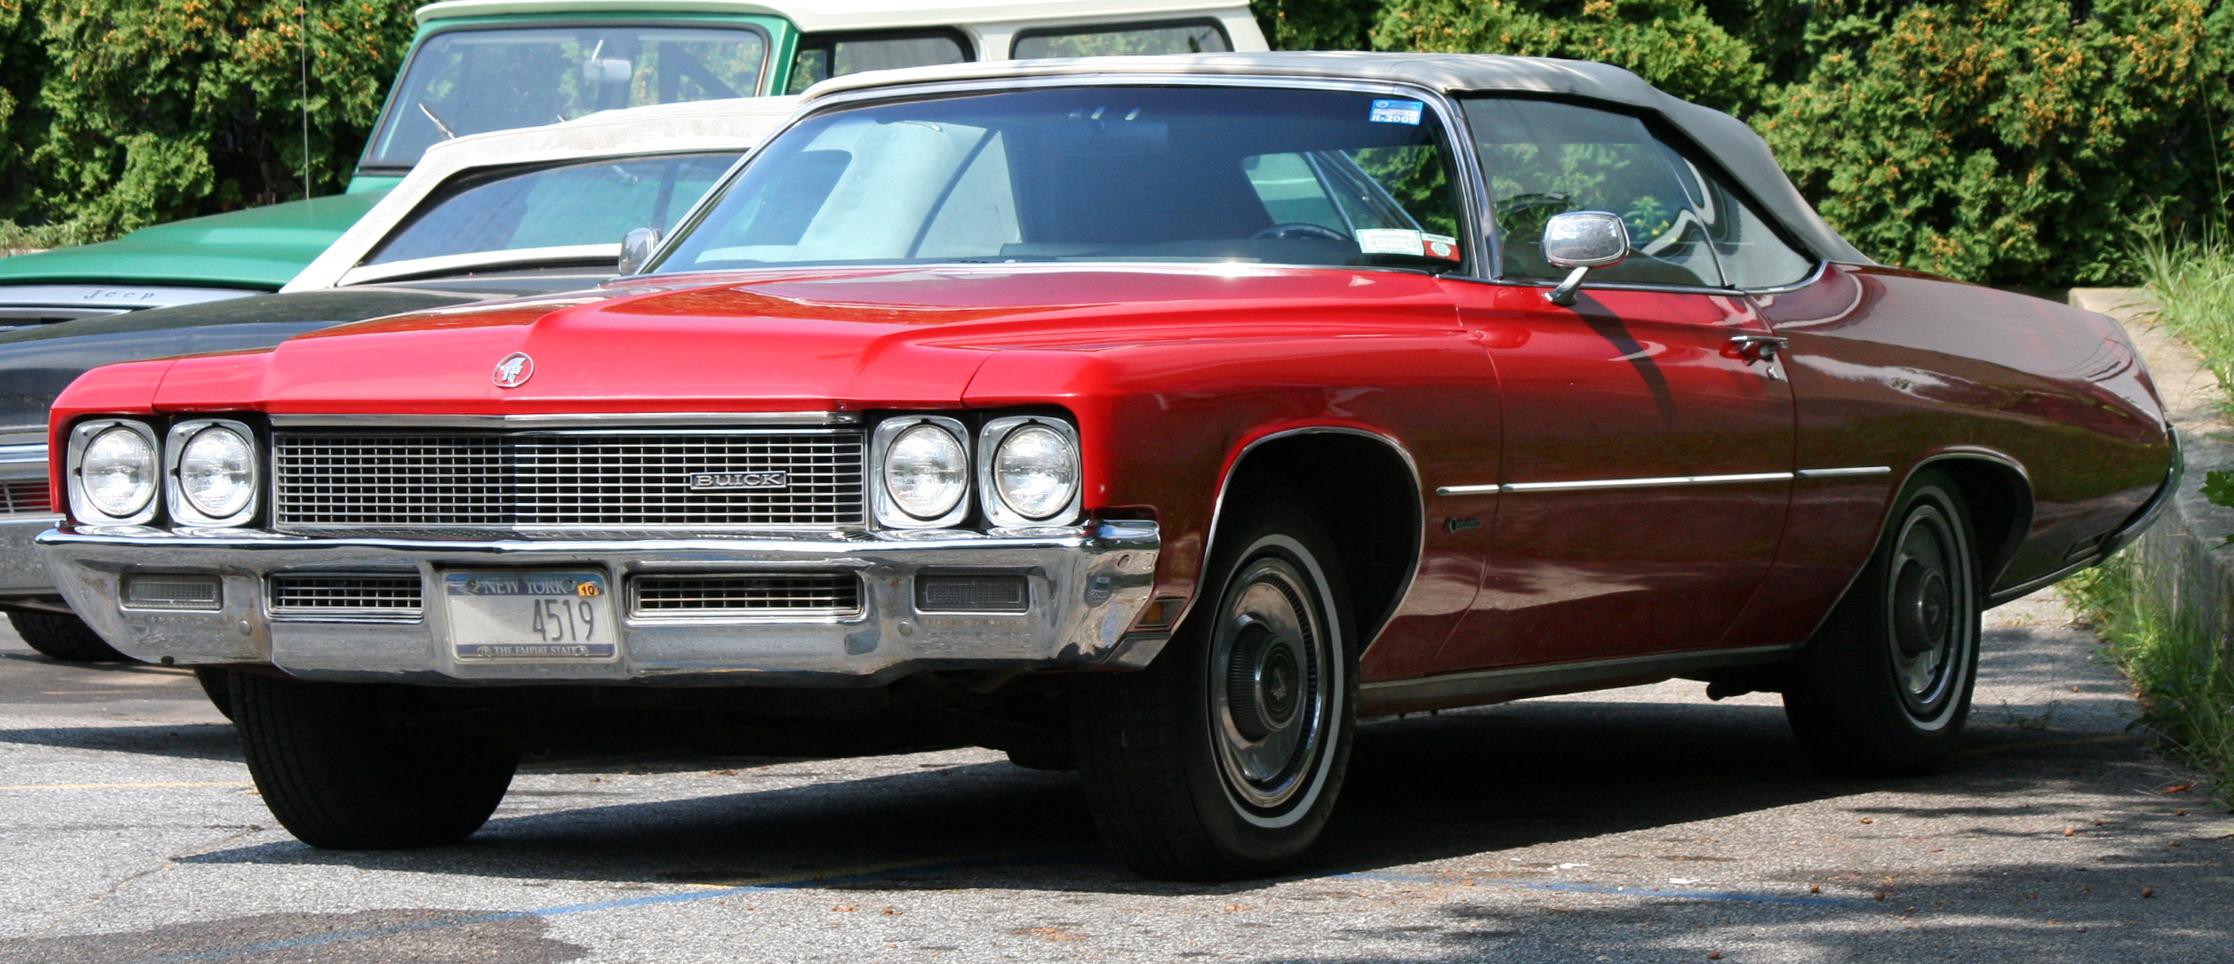 File 1971 Buick Centurion Convertible Fl Jpg Wikimedia